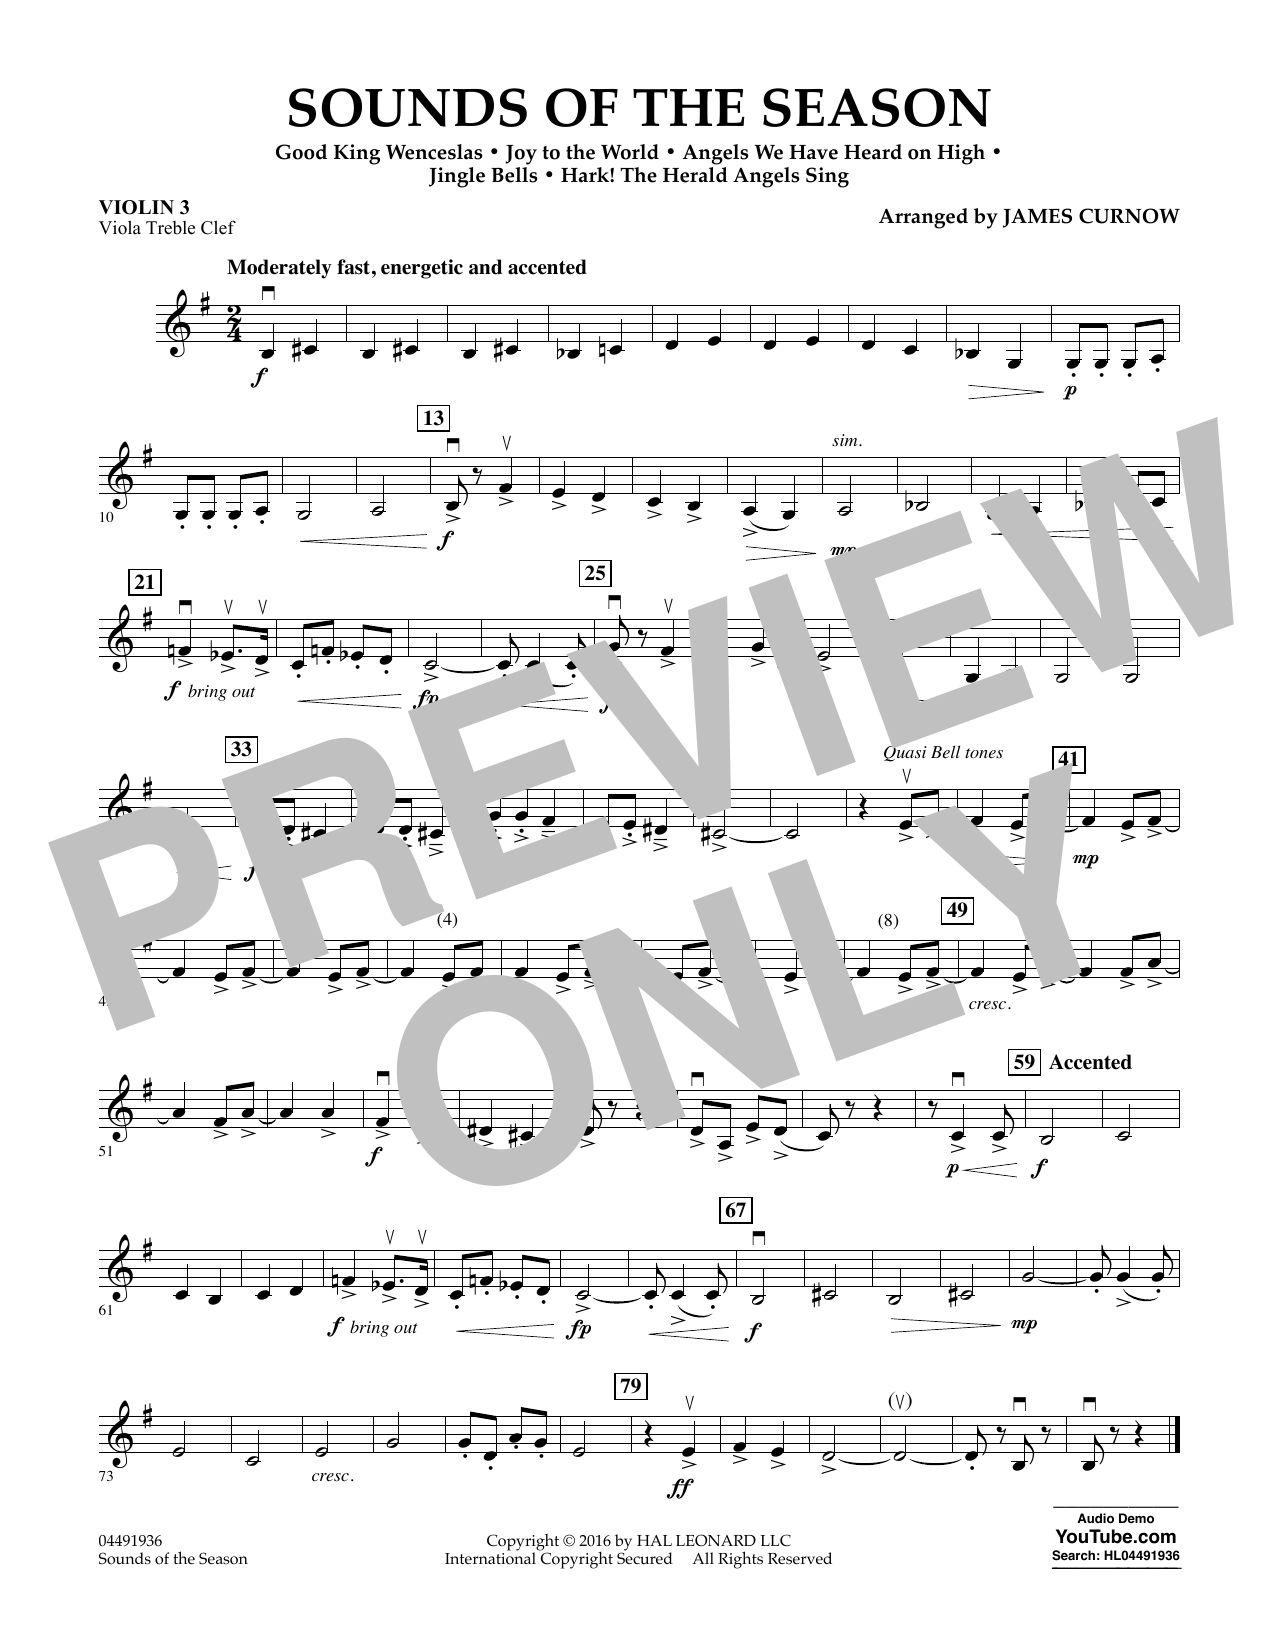 Sounds of the Season - Violin 3 (Viola Treble Clef)